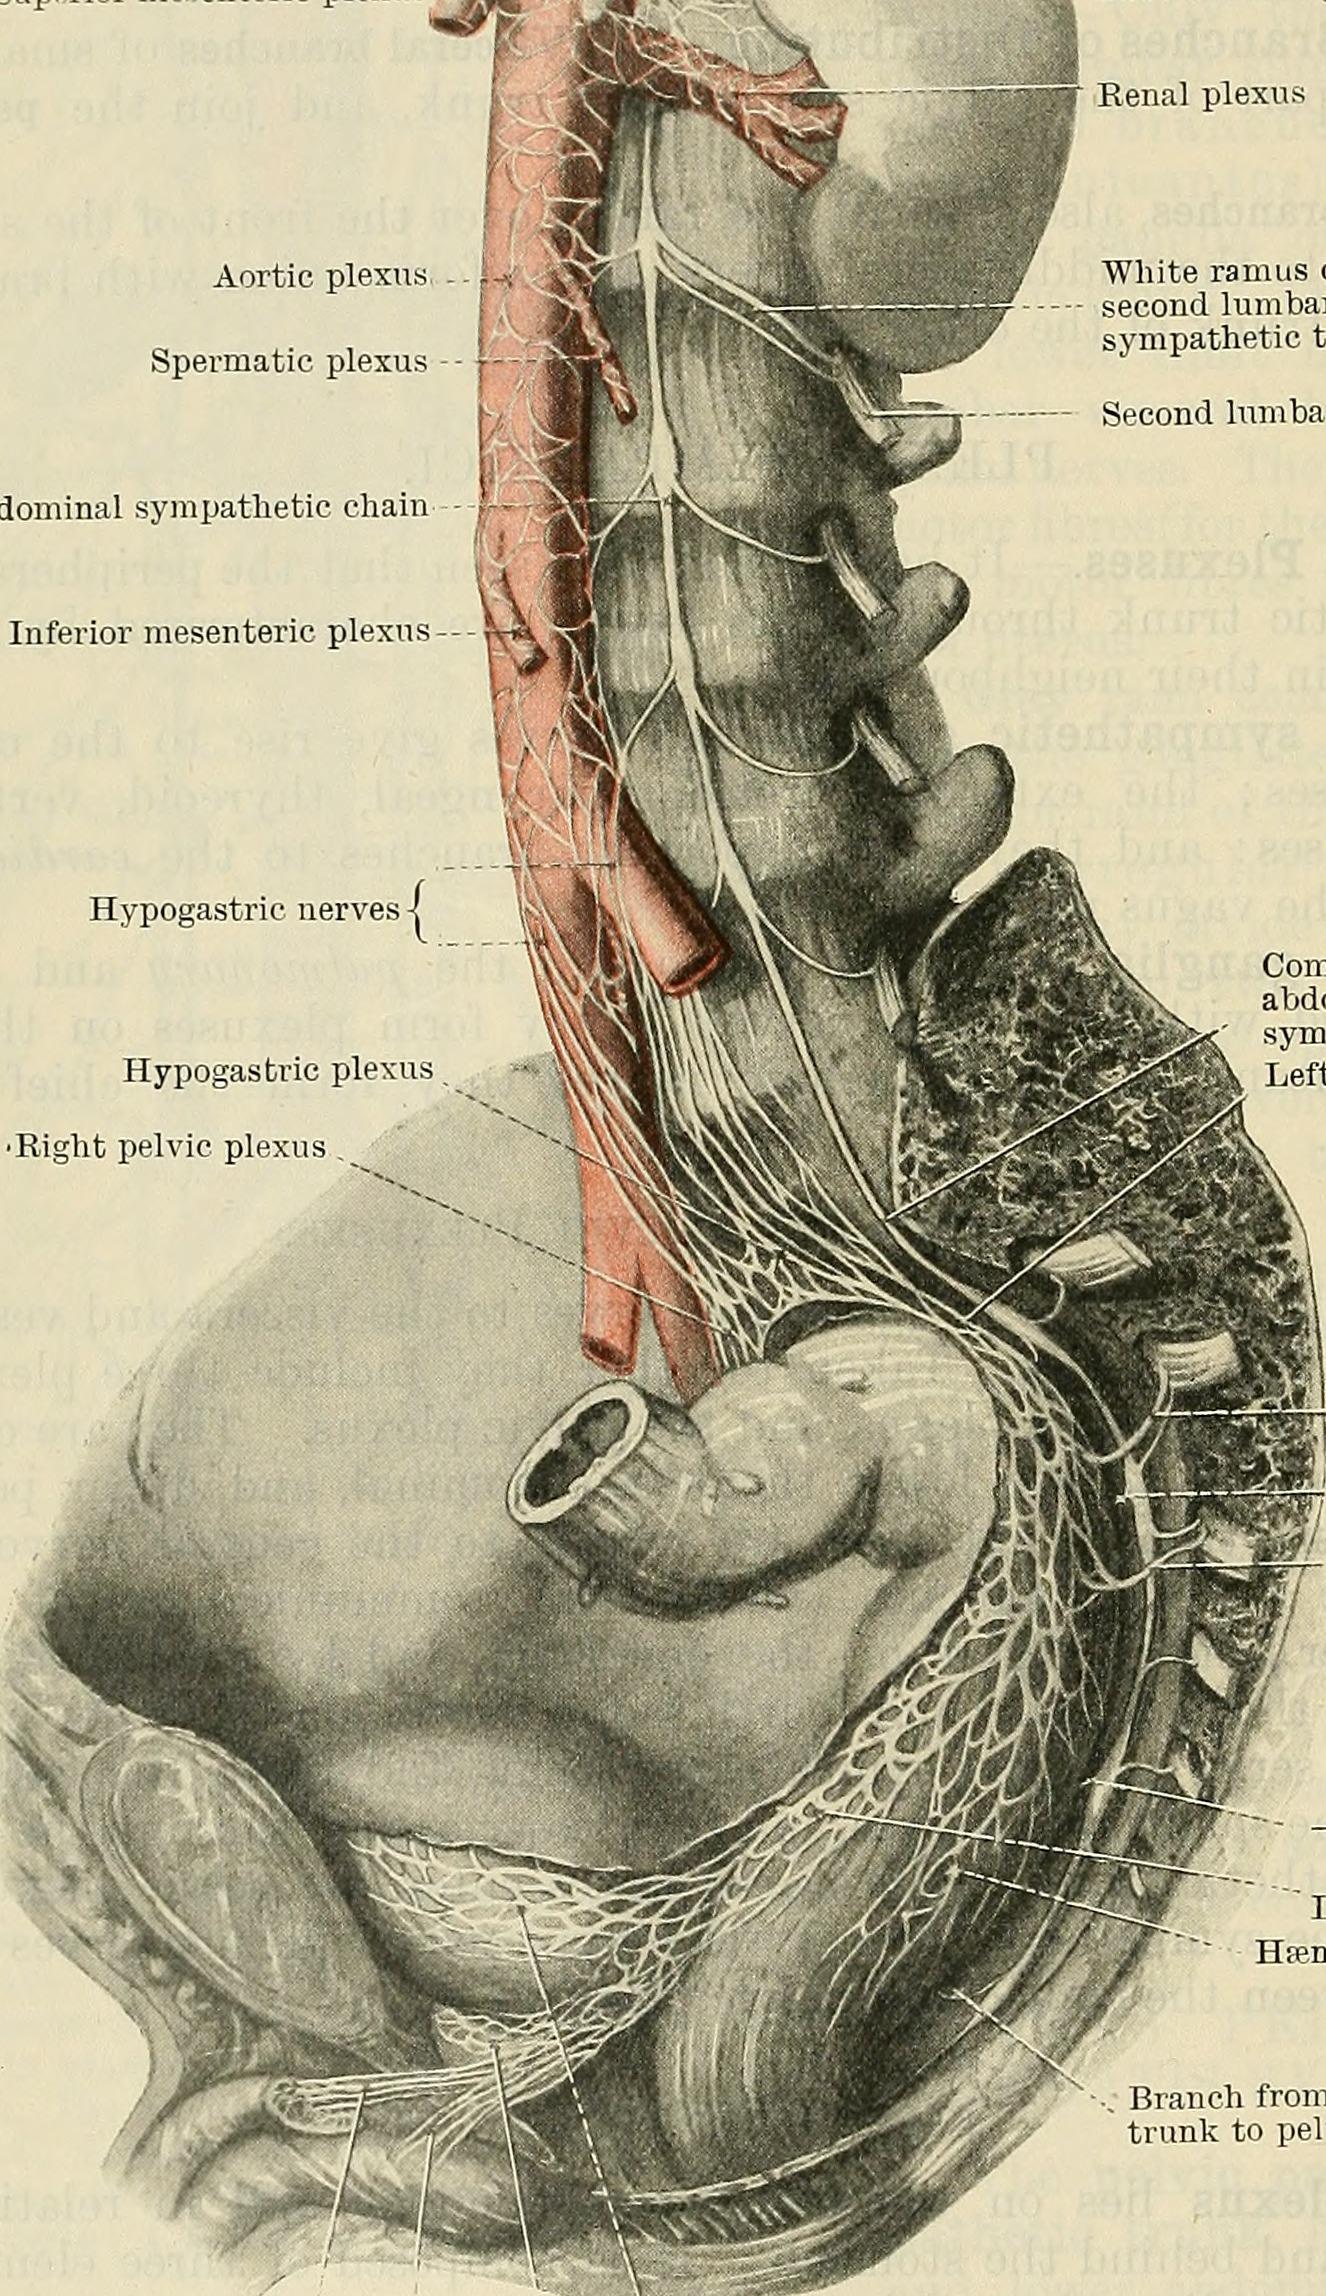 Cunninghams Text Book Of Anatomy 1914 20790477606g